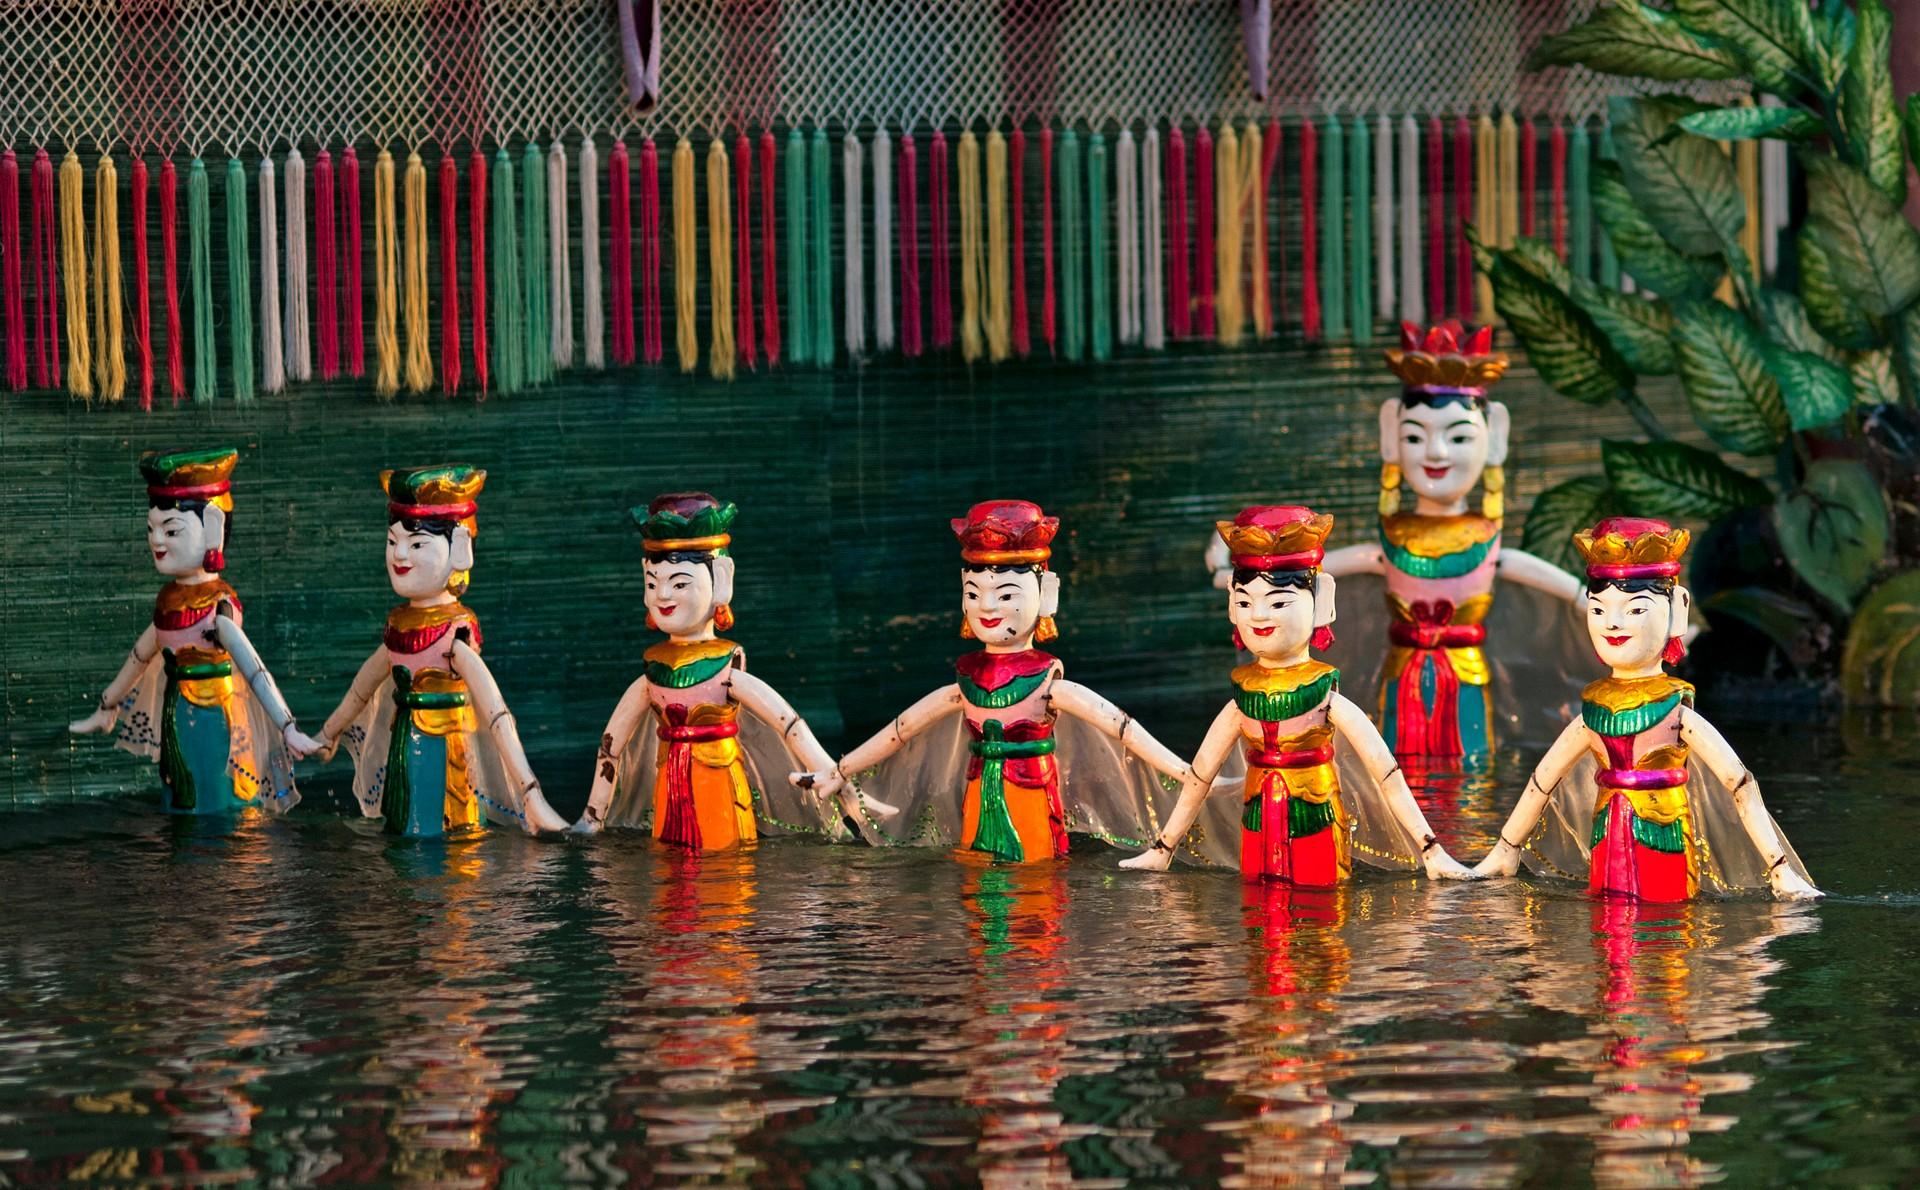 Water puppet show in Hanoi, Vietnam